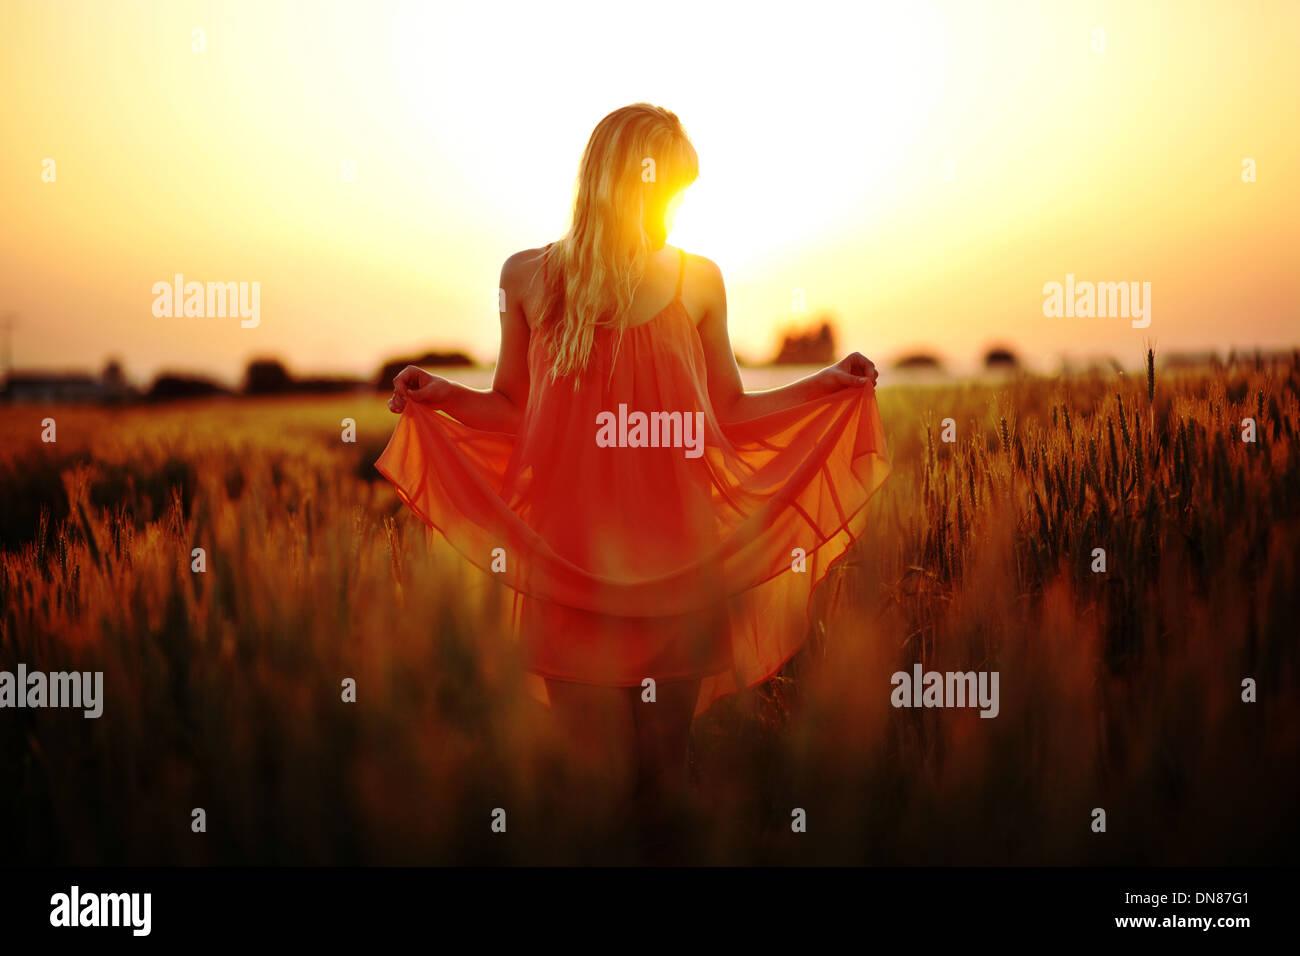 Frau mit Kleid stehen im Kornfeld bei Sonnenuntergang Stockbild